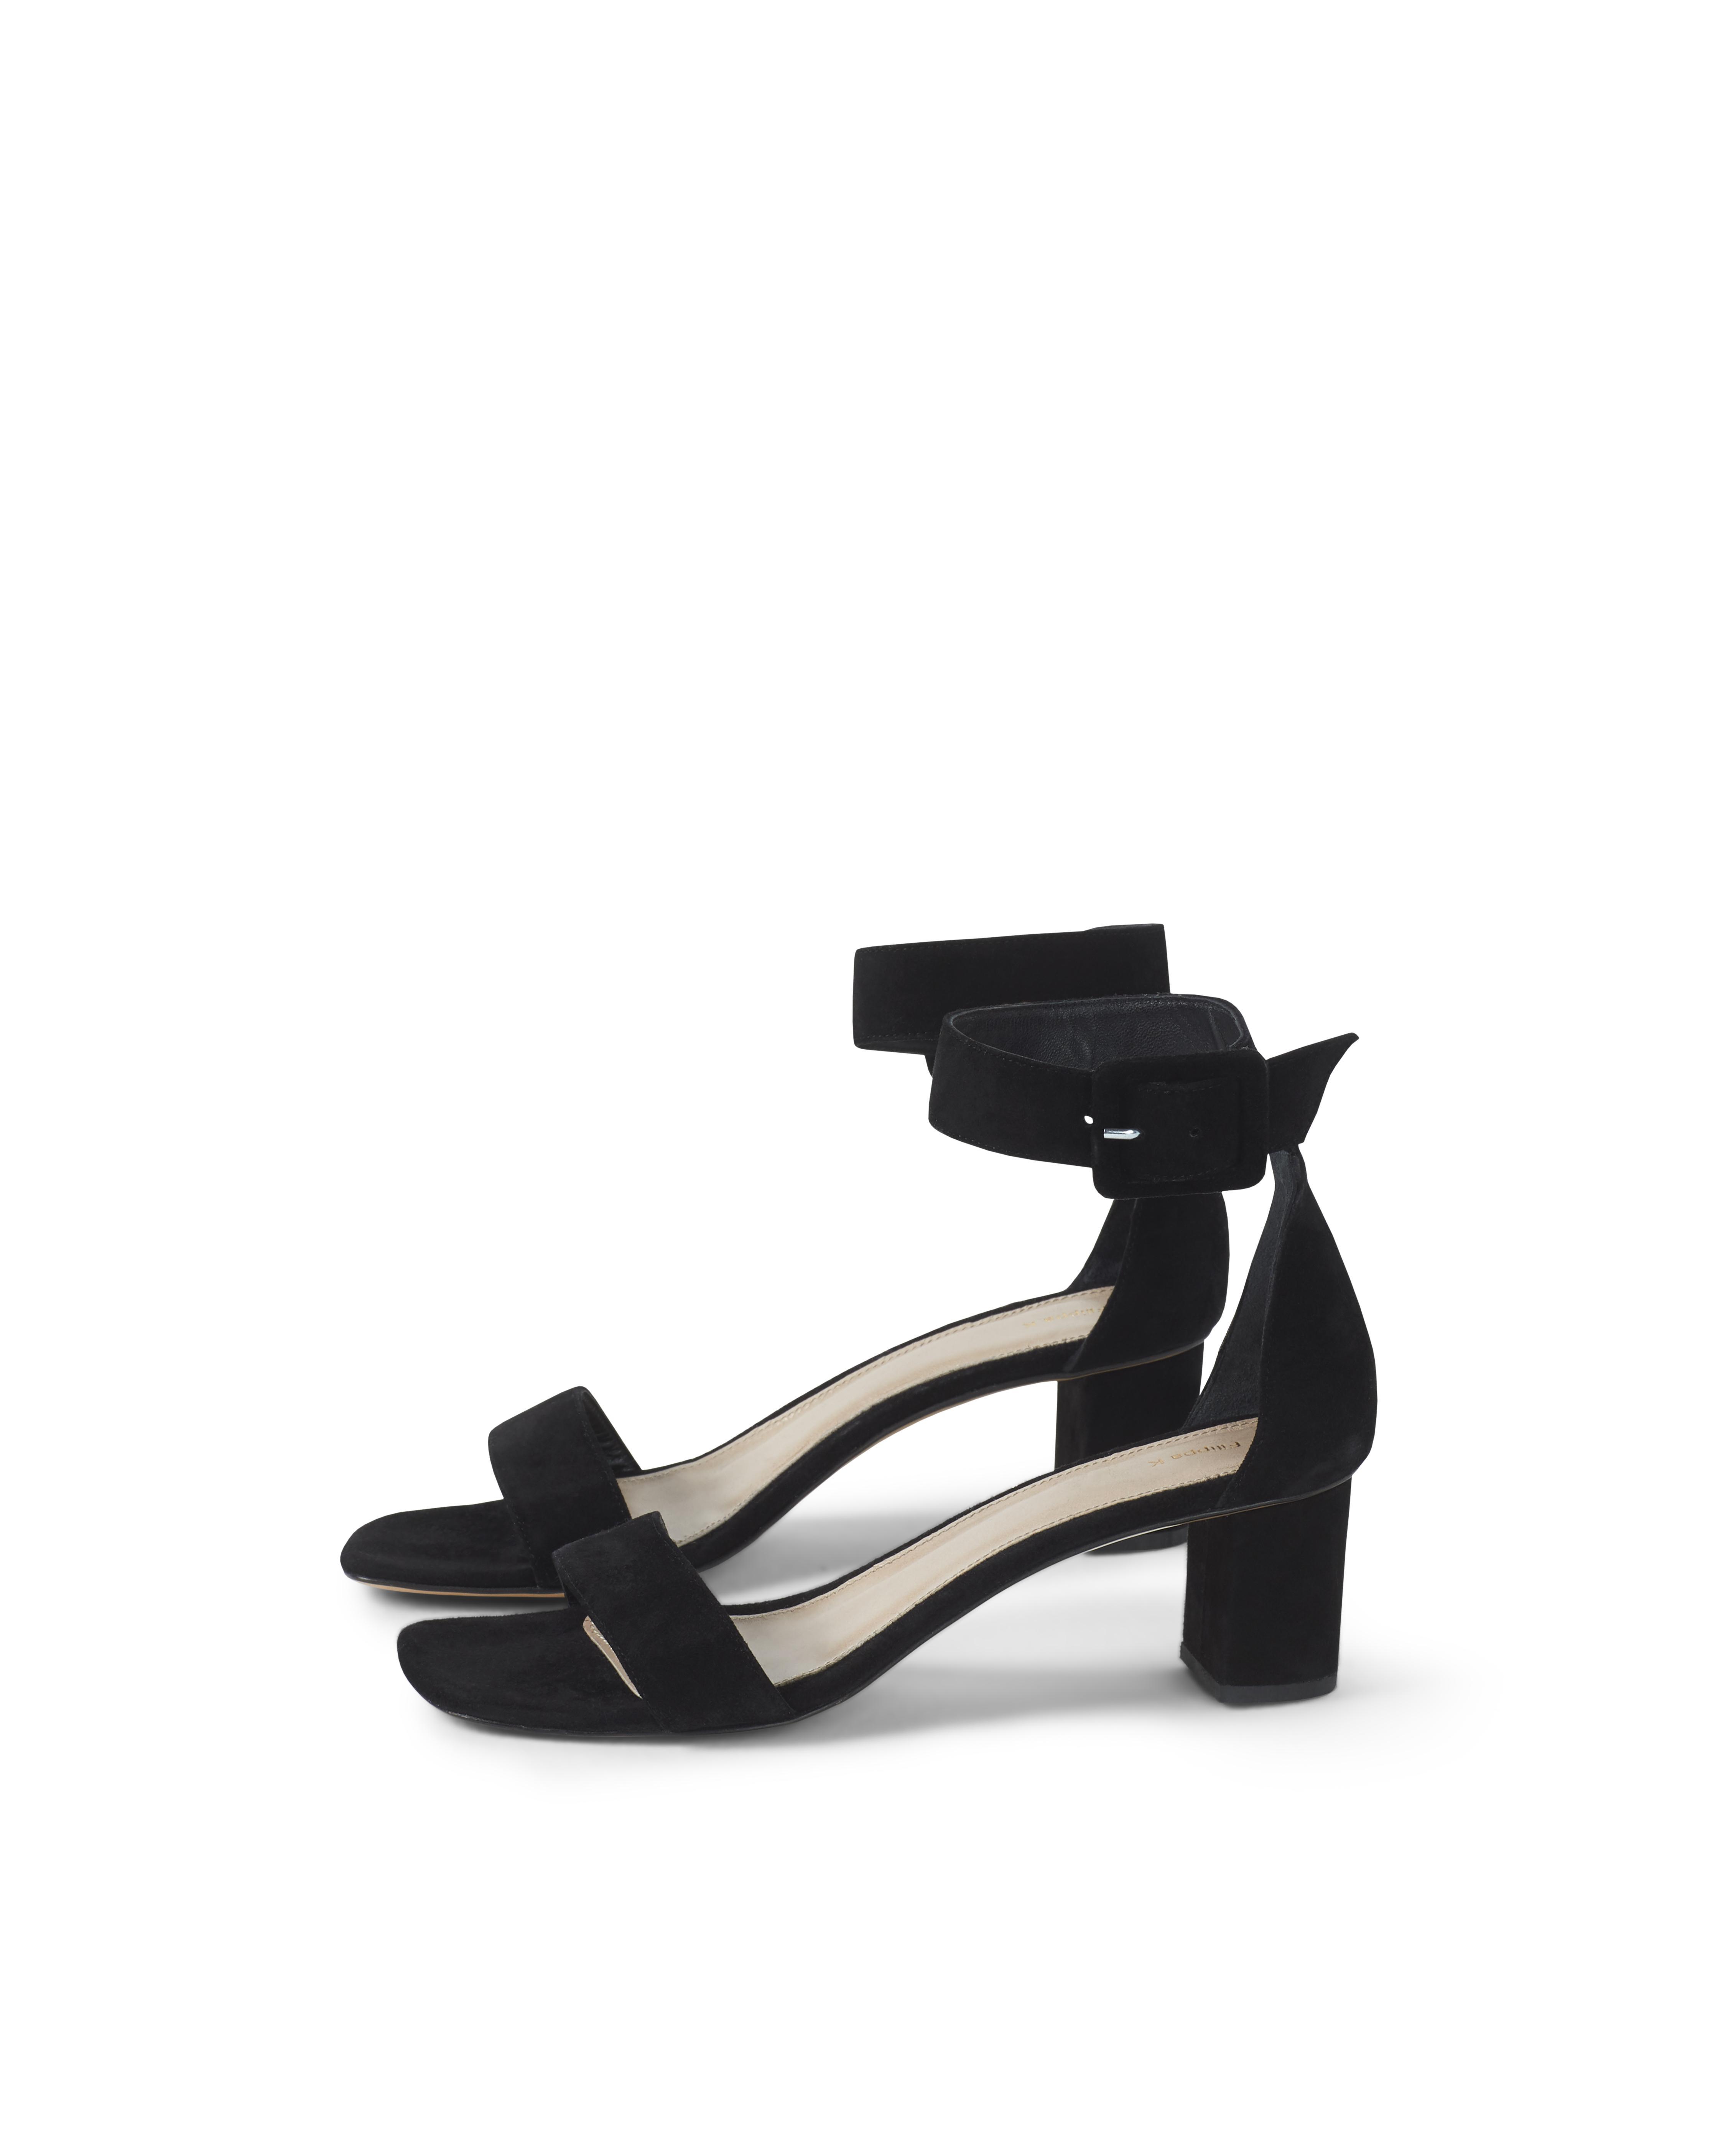 179b2288485c0d Filippa K Frances Mid Heel Sandal in Black - Lyst